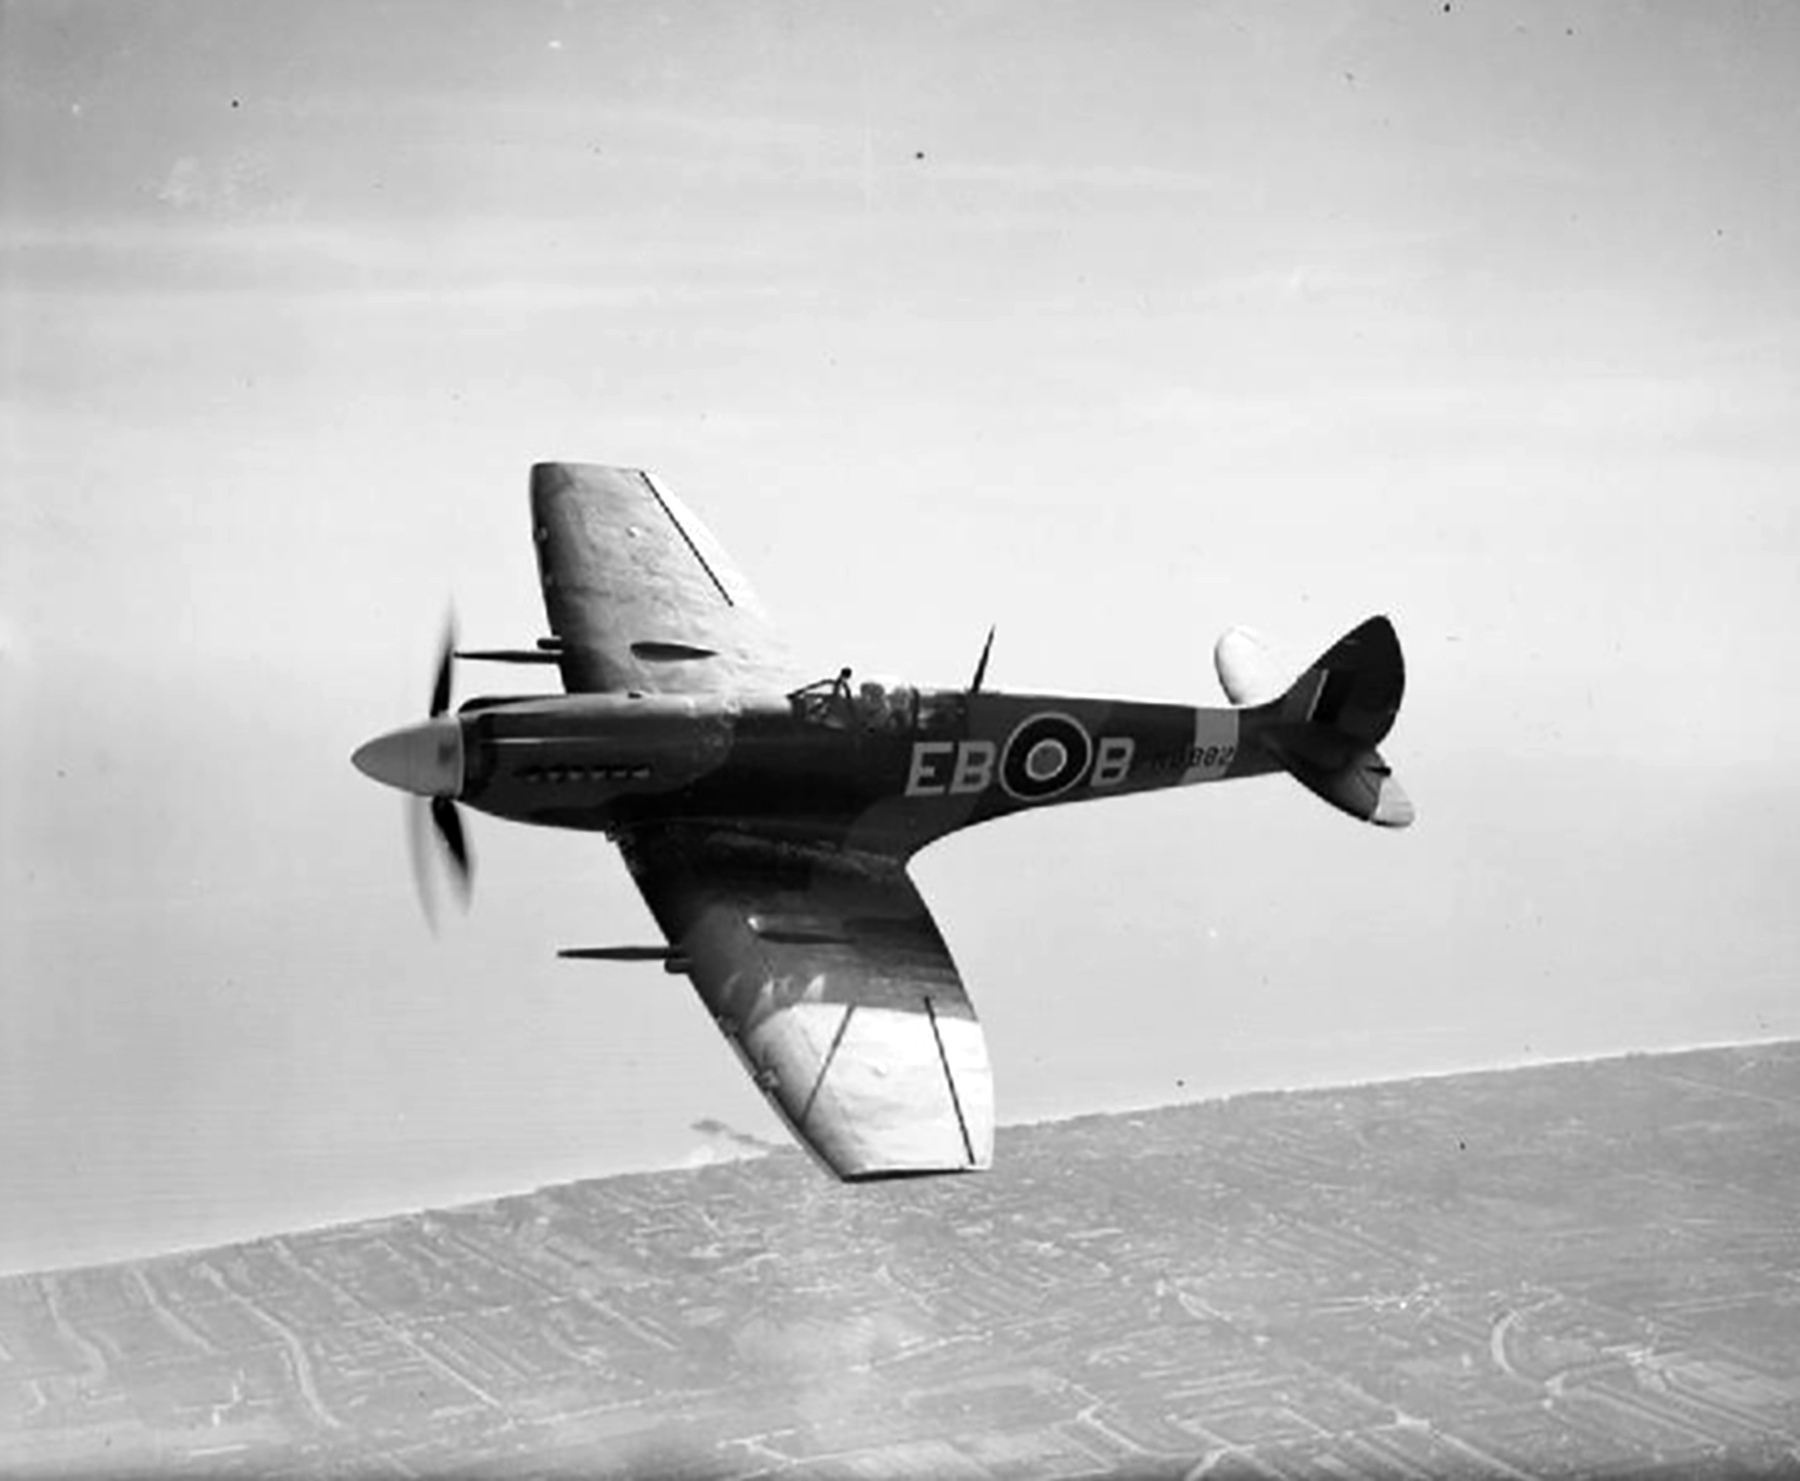 Spitfire XII RAF 41Sqn EBB Don Smith MB882 over Eastbourne 1943 01